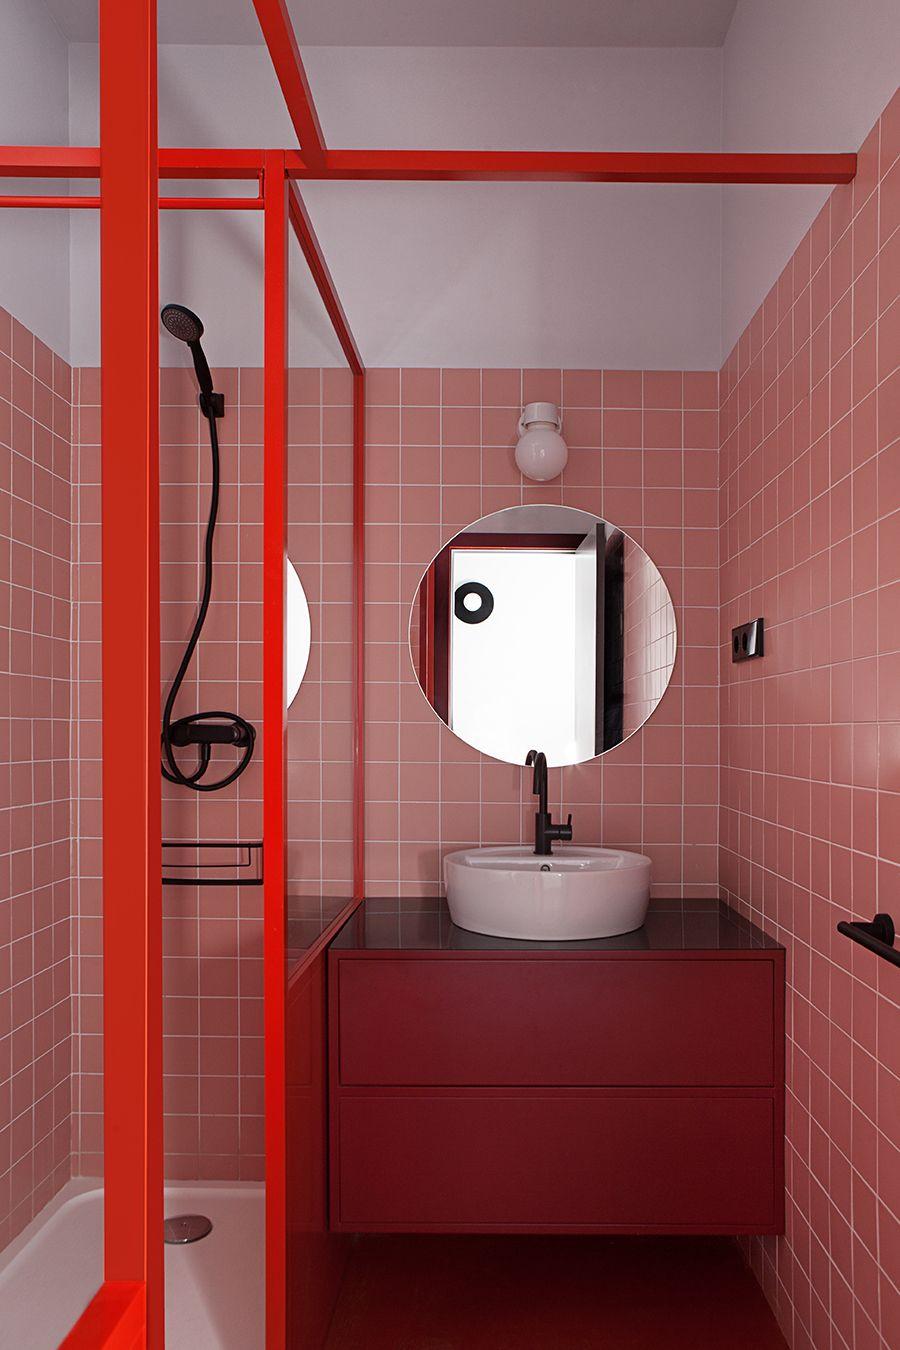 Plutarco designed bathrooms interiors pinterest - Decoracion piso de estudiantes ...